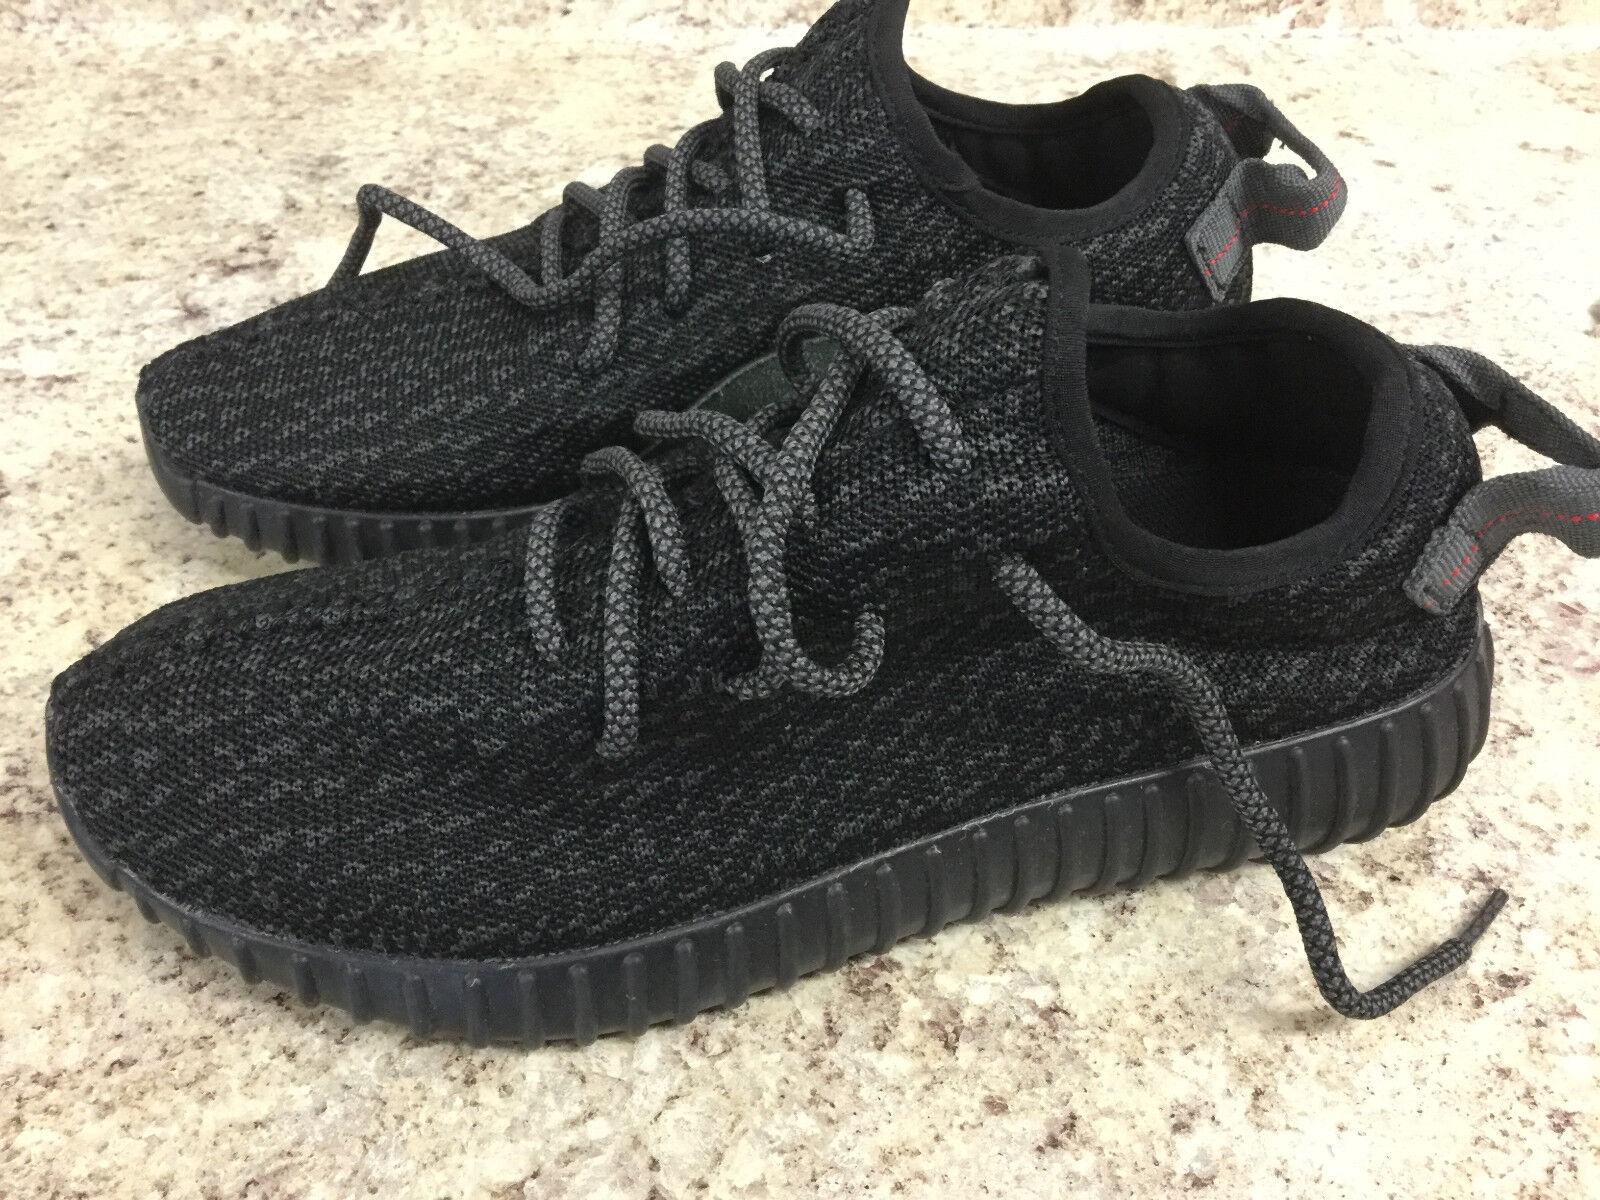 Mens Adidas Yeezy Boost 350 Pirate Black AQ2659 US Size 7